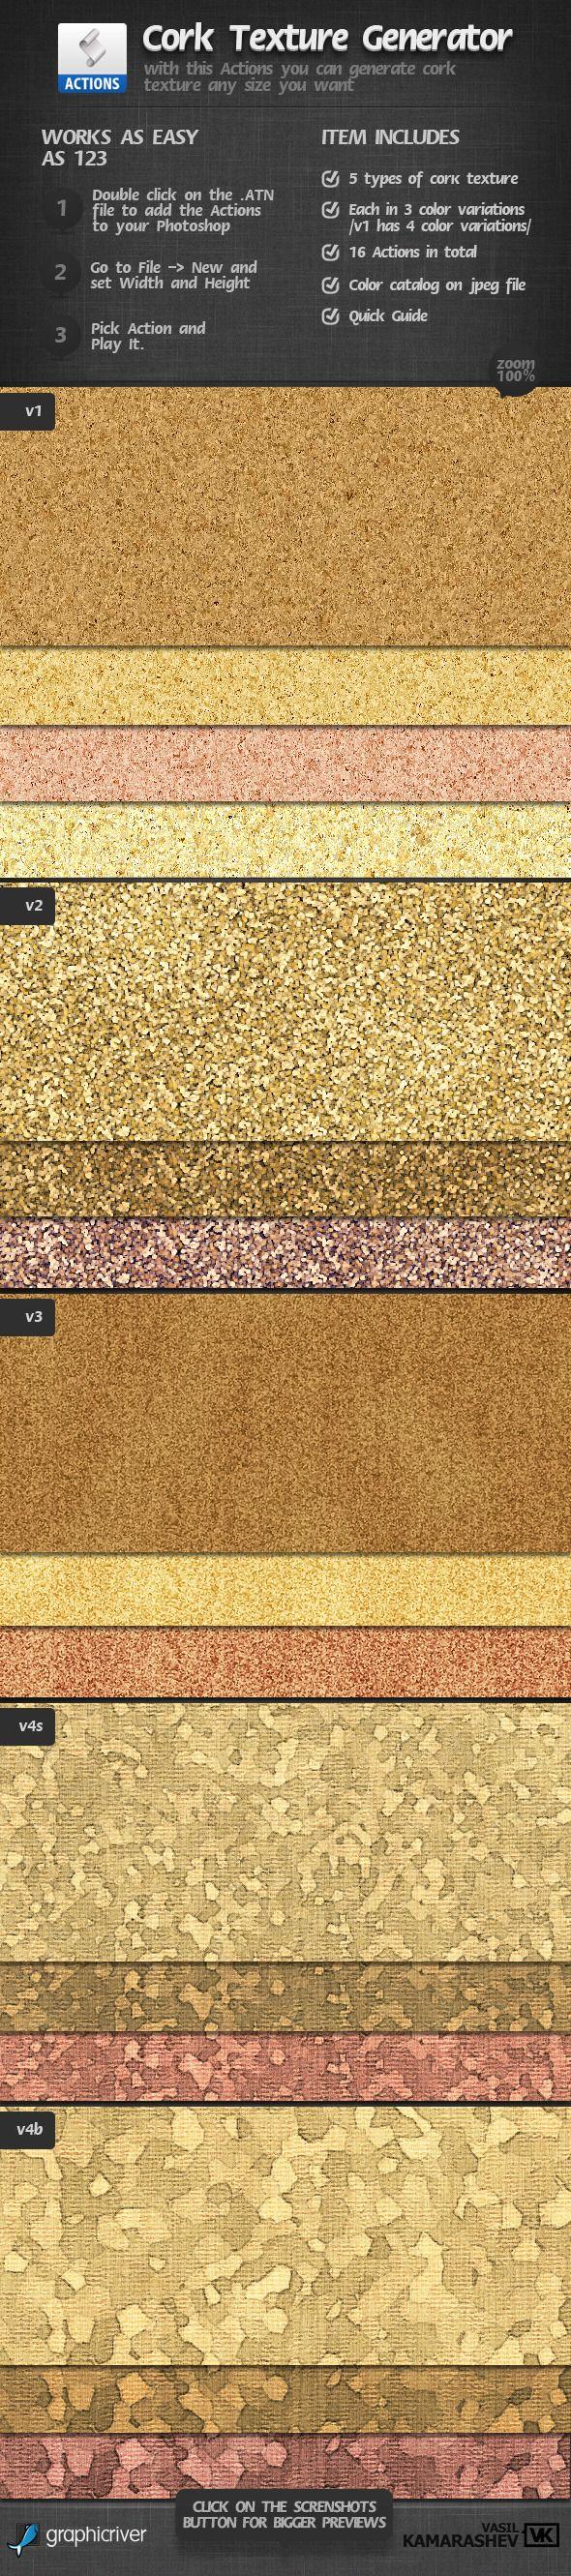 Cork Texture Generator — Photoshop ATN #cork #texture • Available here → https://graphicriver.net/item/cork-texture-generator/2304965?ref=pxcr